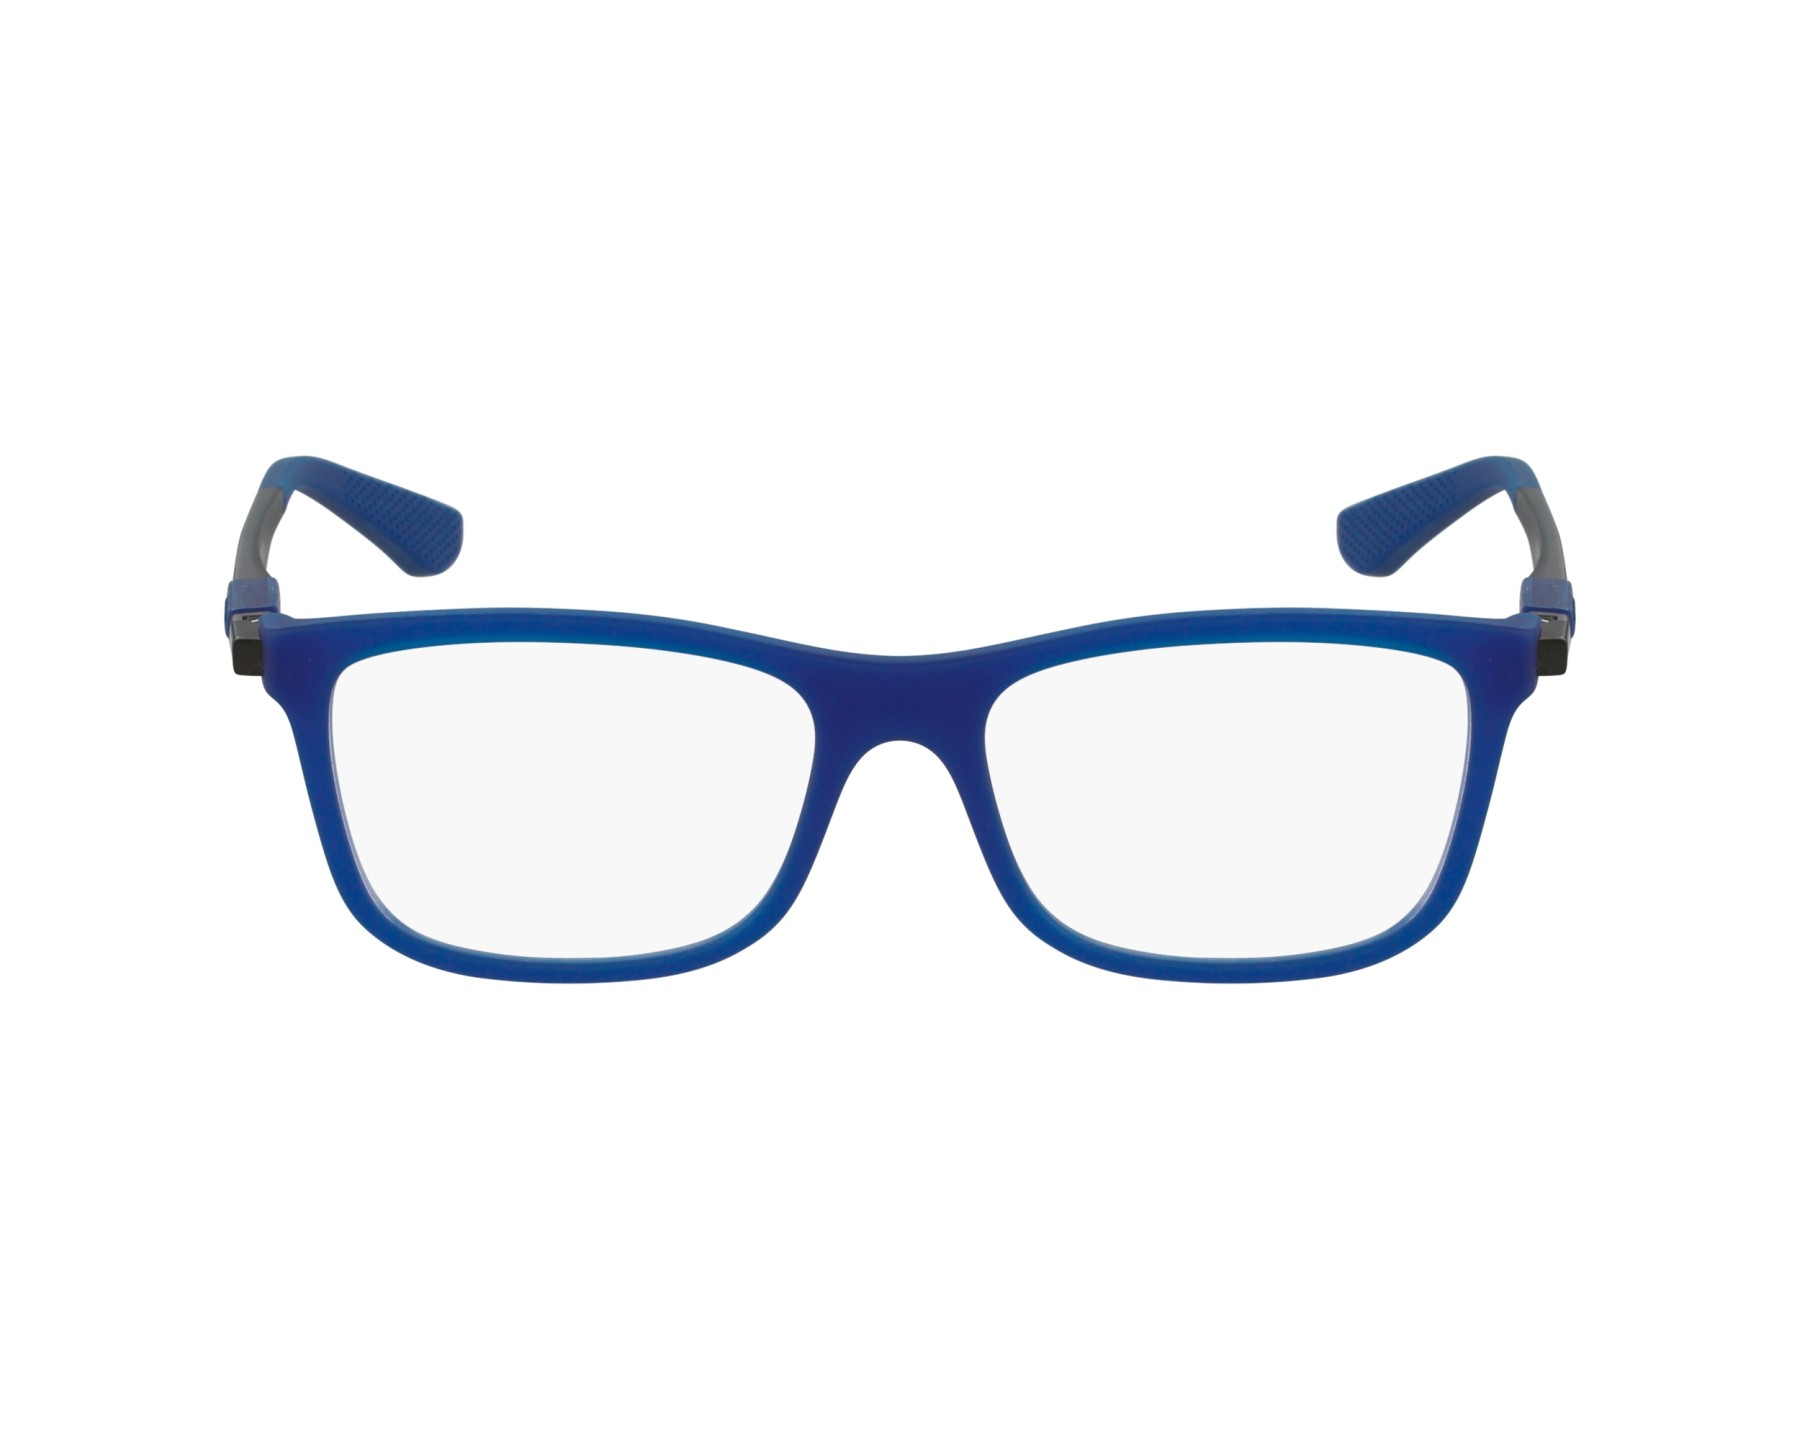 2f1dbe4d4b ... order eyeglasses ray ban ry 1549 3655 48 16 blue gun profile view 1b1f4  6bf6e